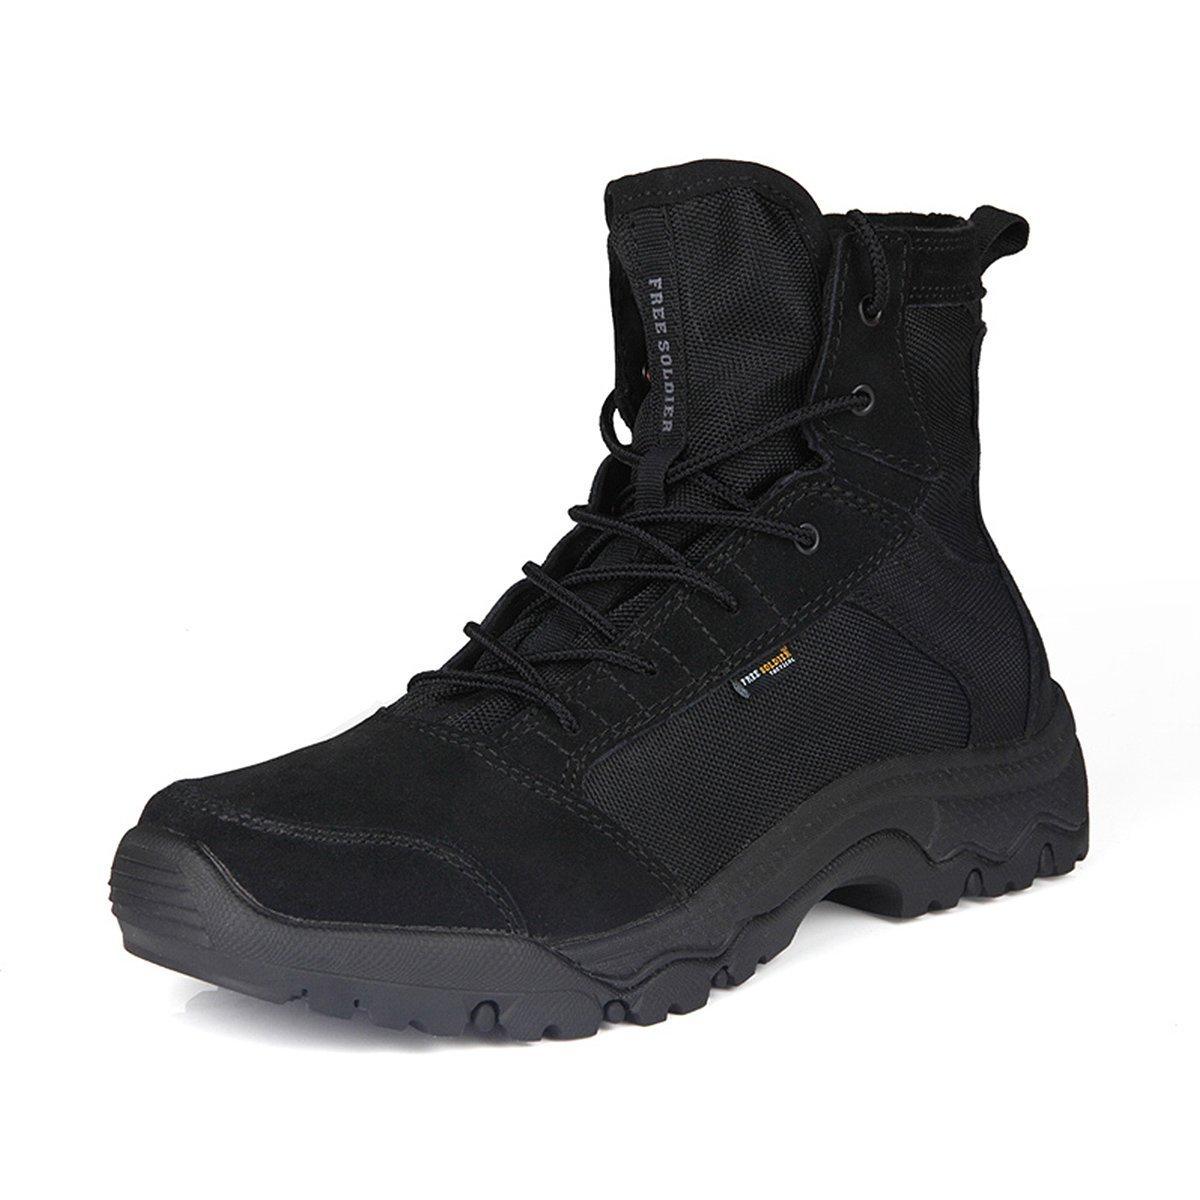 FREE SOLDIER Men's Lightweight Tactical Boots - Desert Tan(Black 10 US)